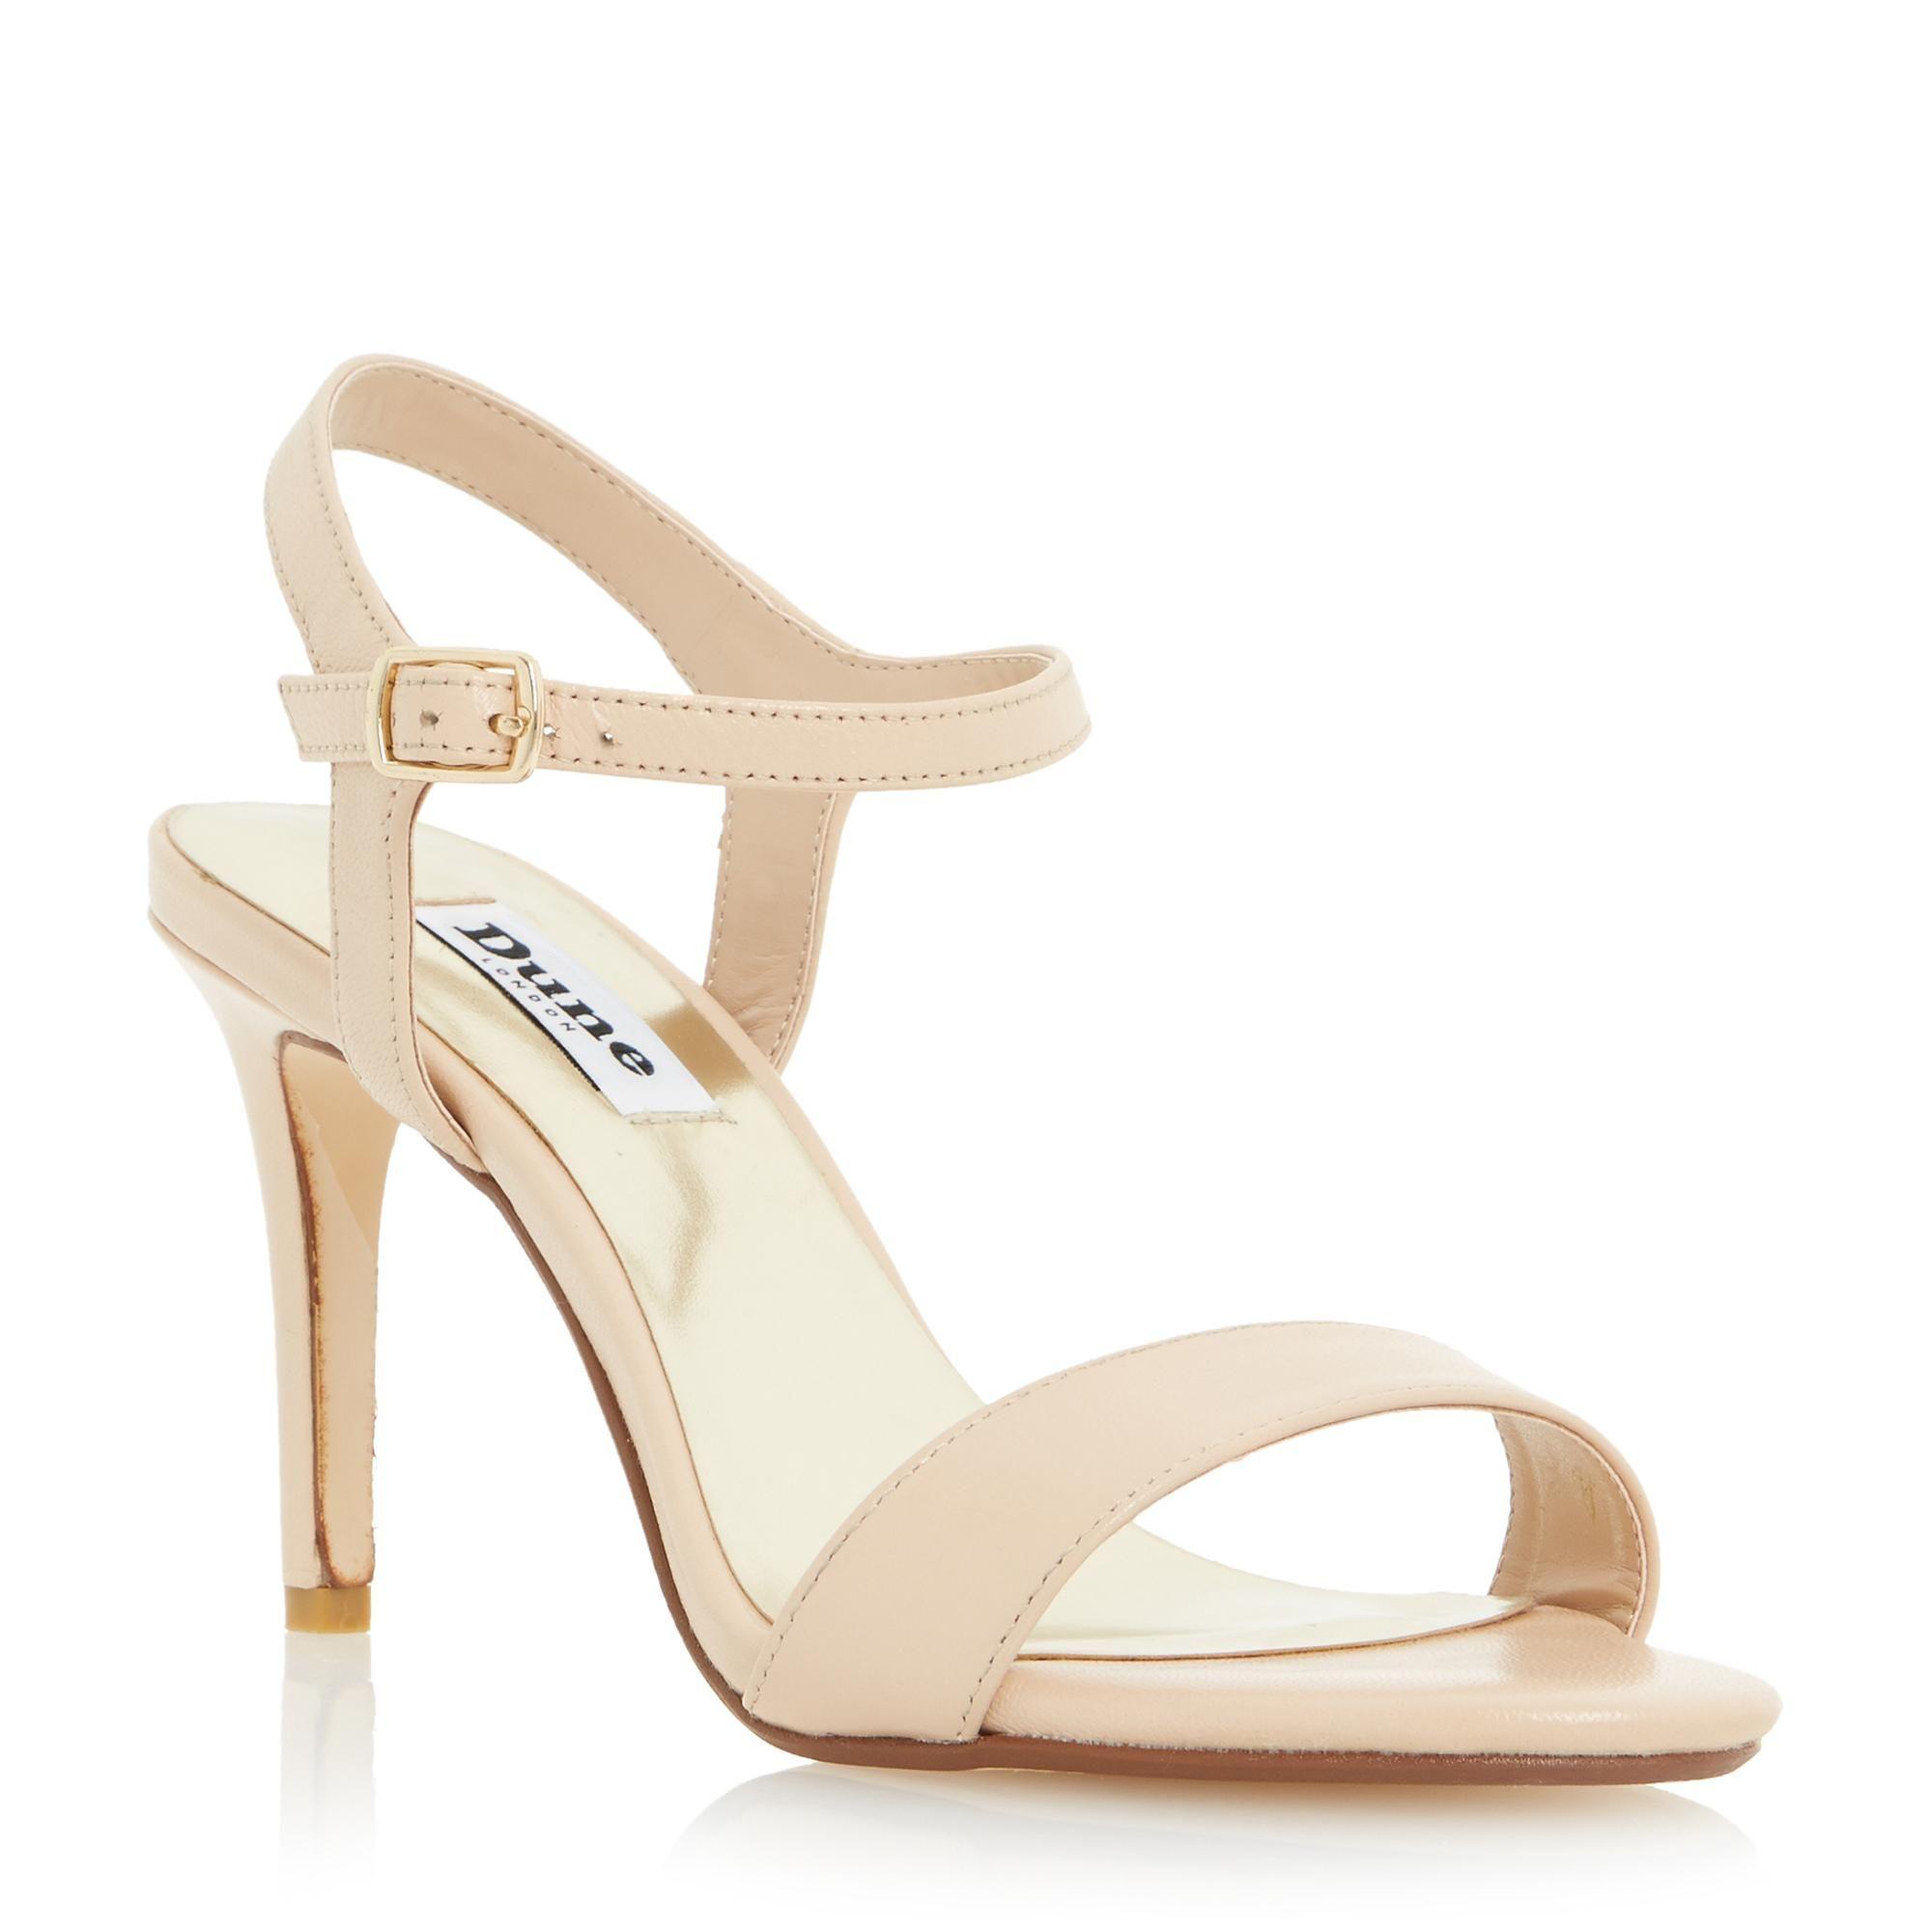 0d0ed7ddcd0 ✔️ Perfect nude mid-heel. | Wishlist | Mid heel sandals, Sandals ...